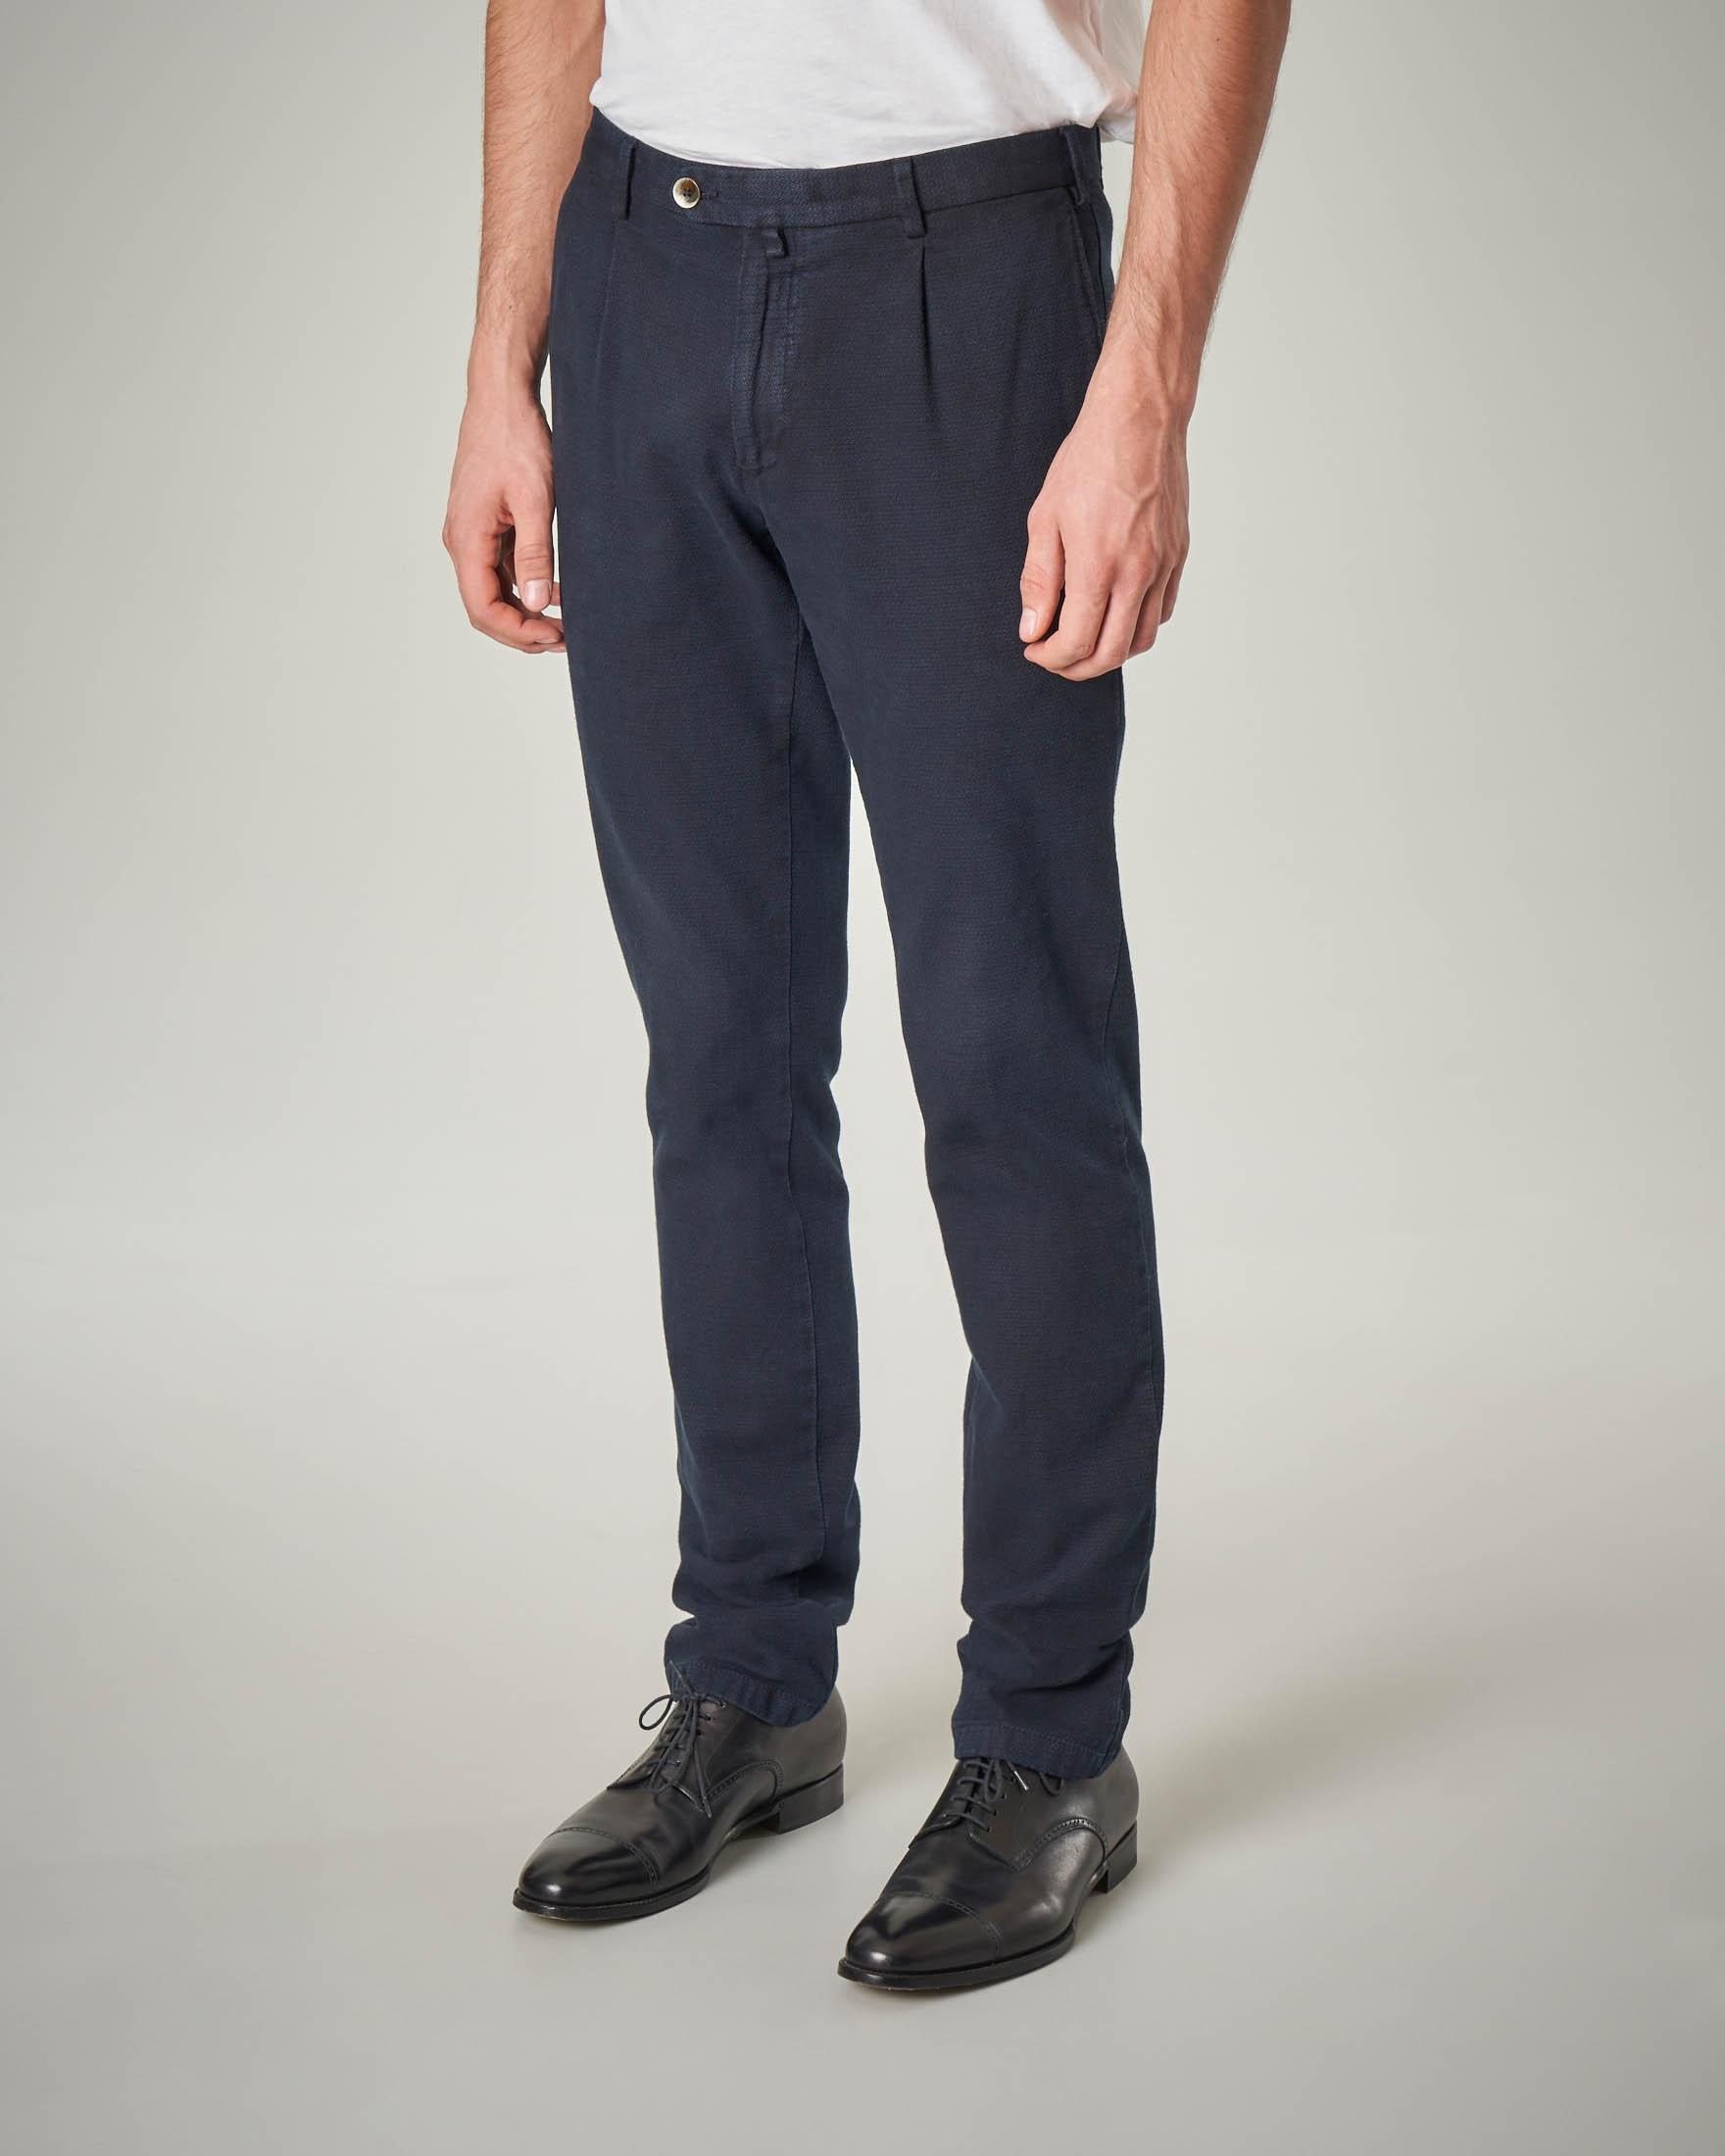 Pantalone chino blu con una pinces